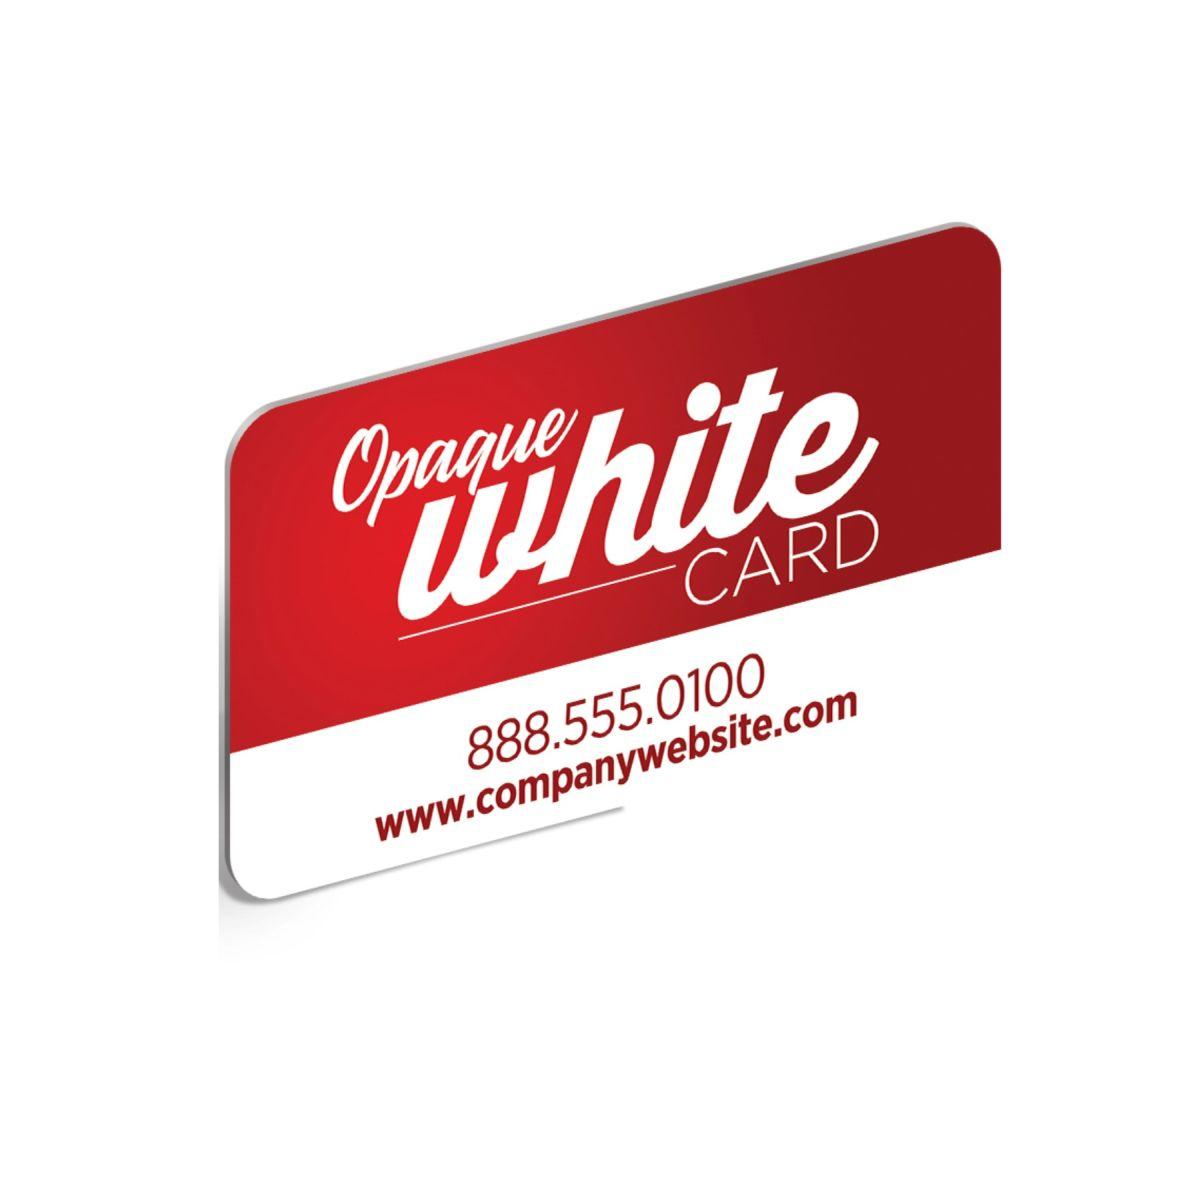 WhitePlastic-Business-Card-022118-3